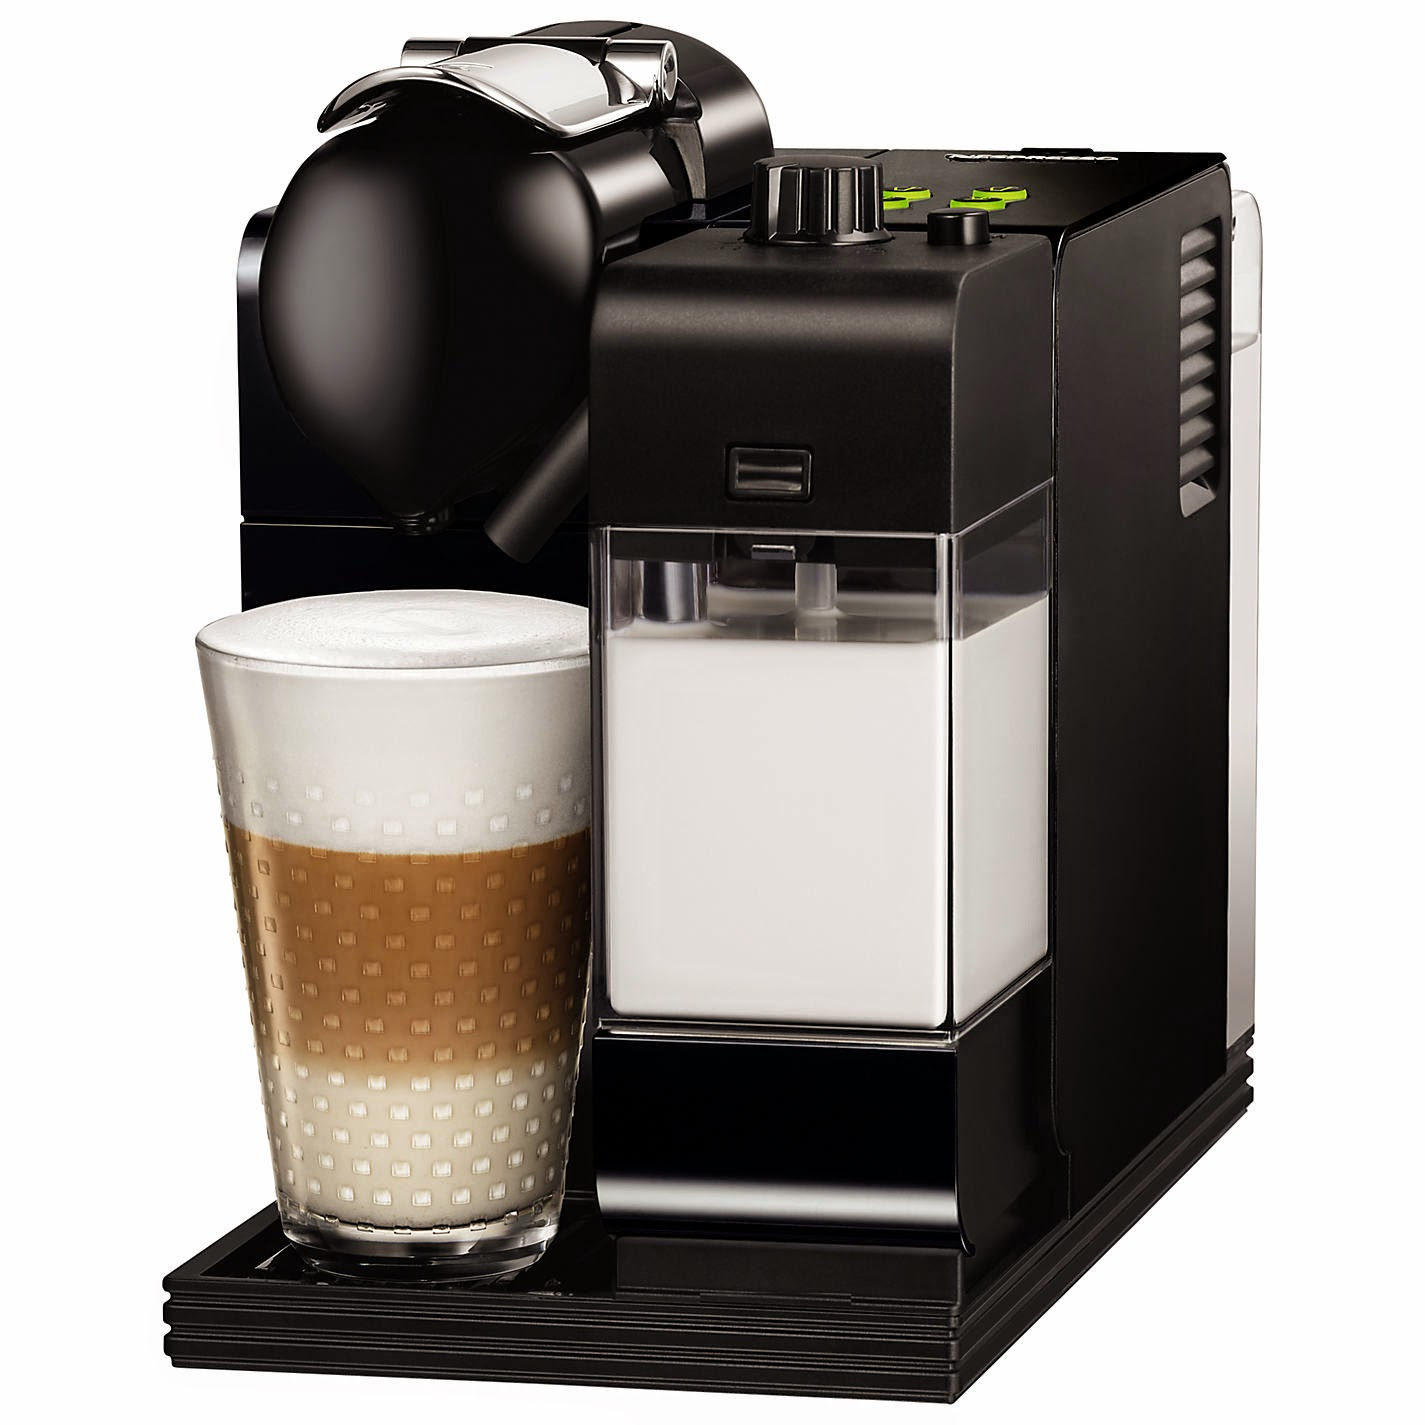 Great Coffee! The Best Nespresso Lattissima Plus Machines